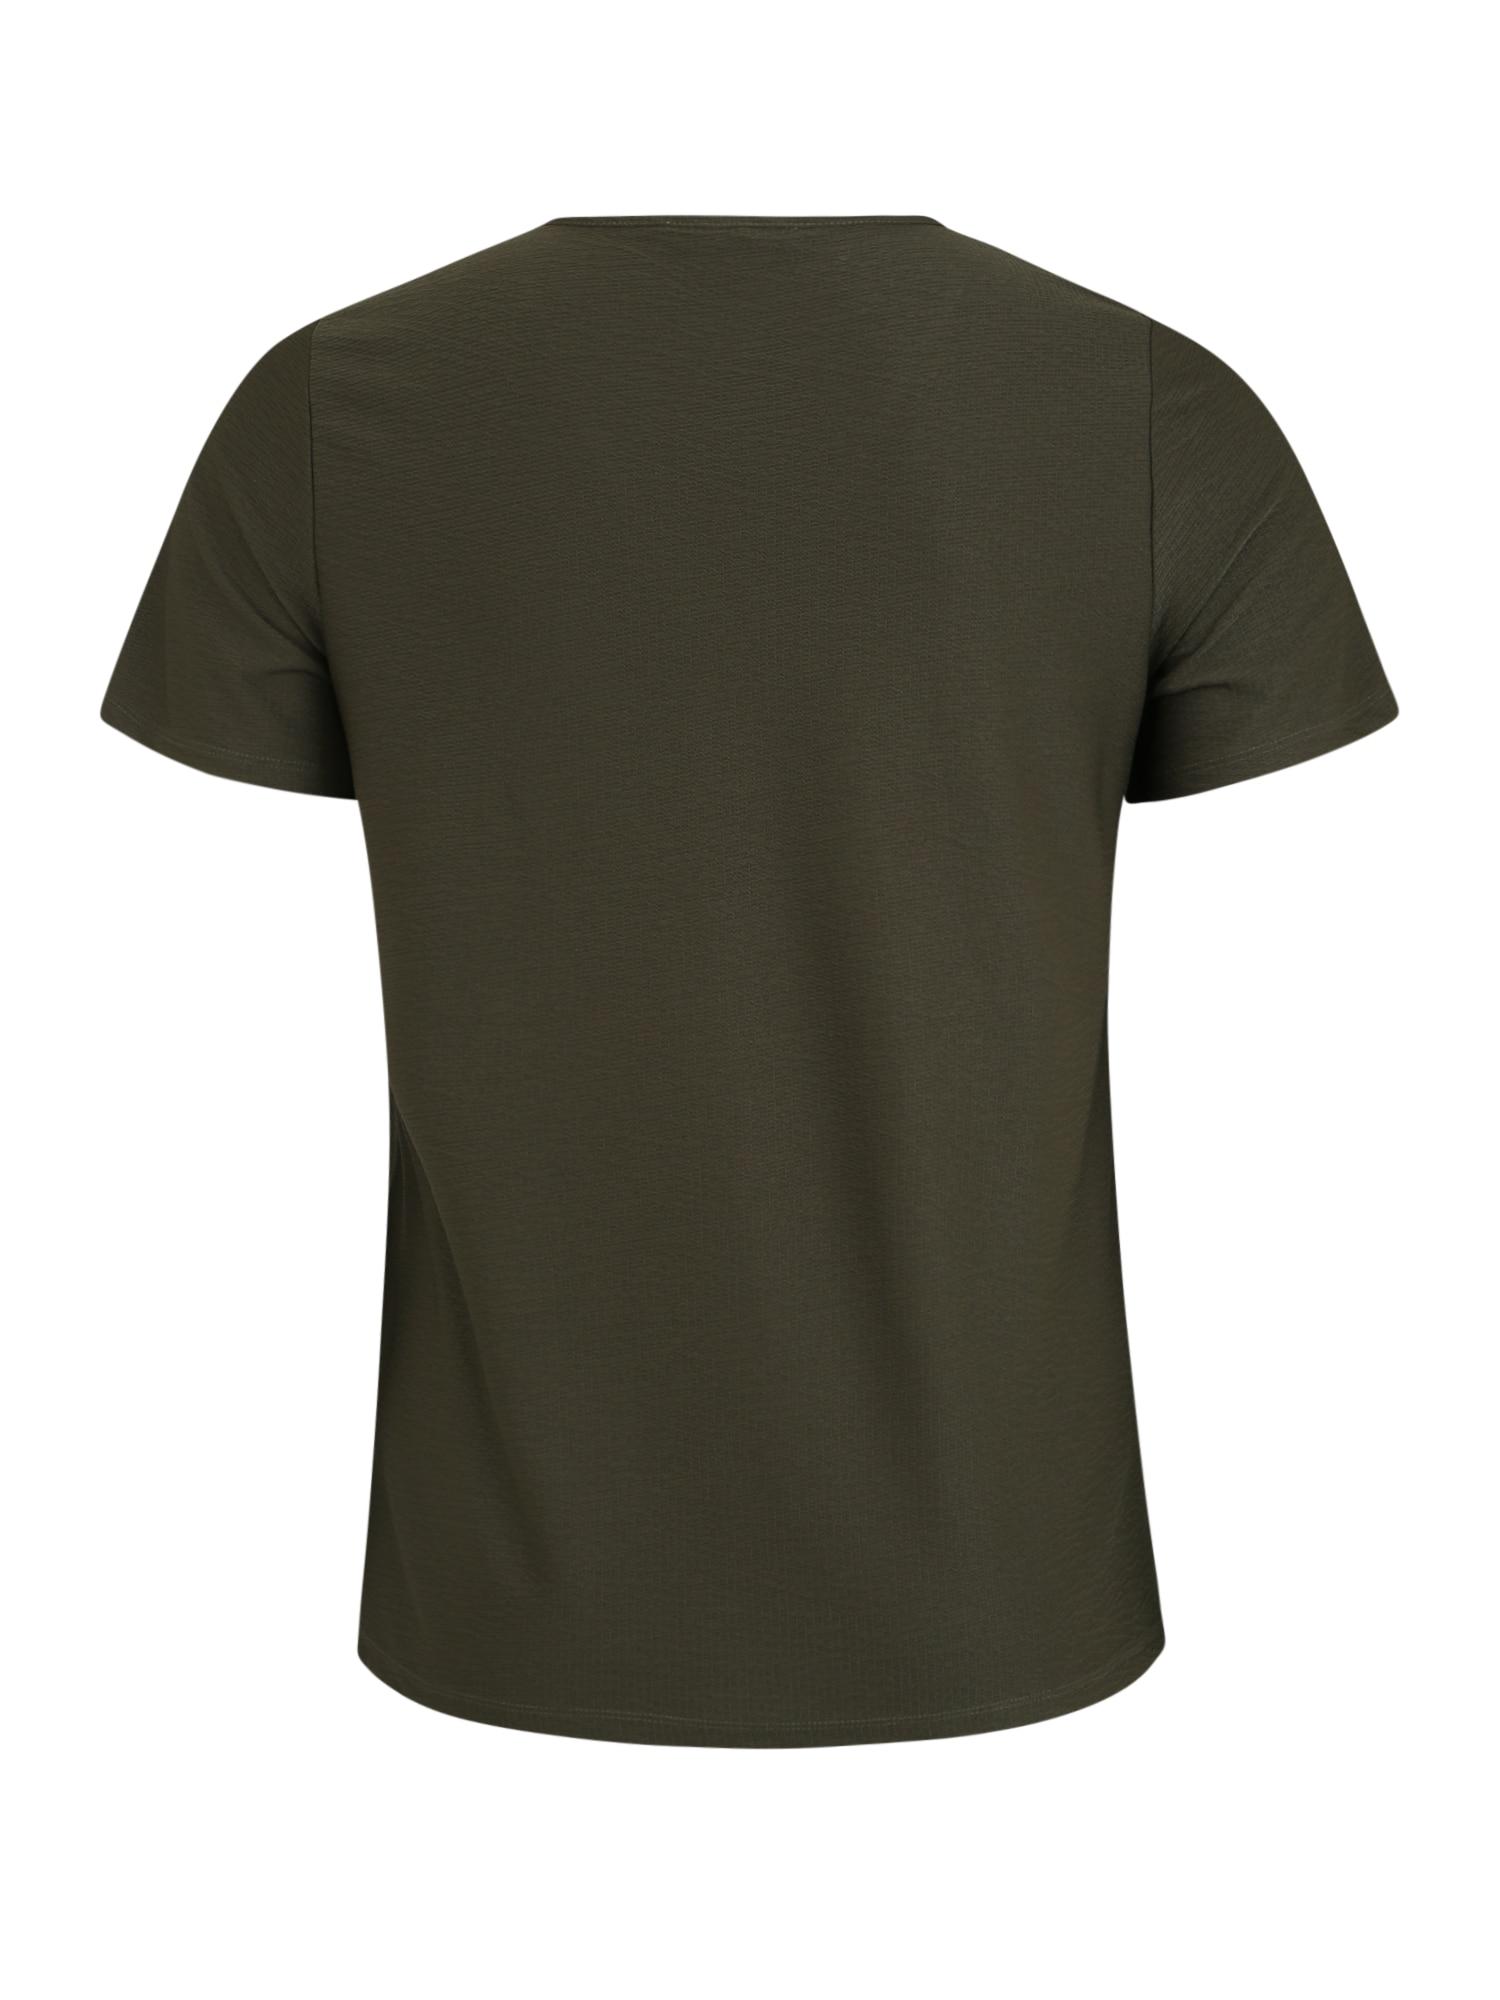 ABOUT YOU Curvy T-shirt 'Alexis'  mörkgrön